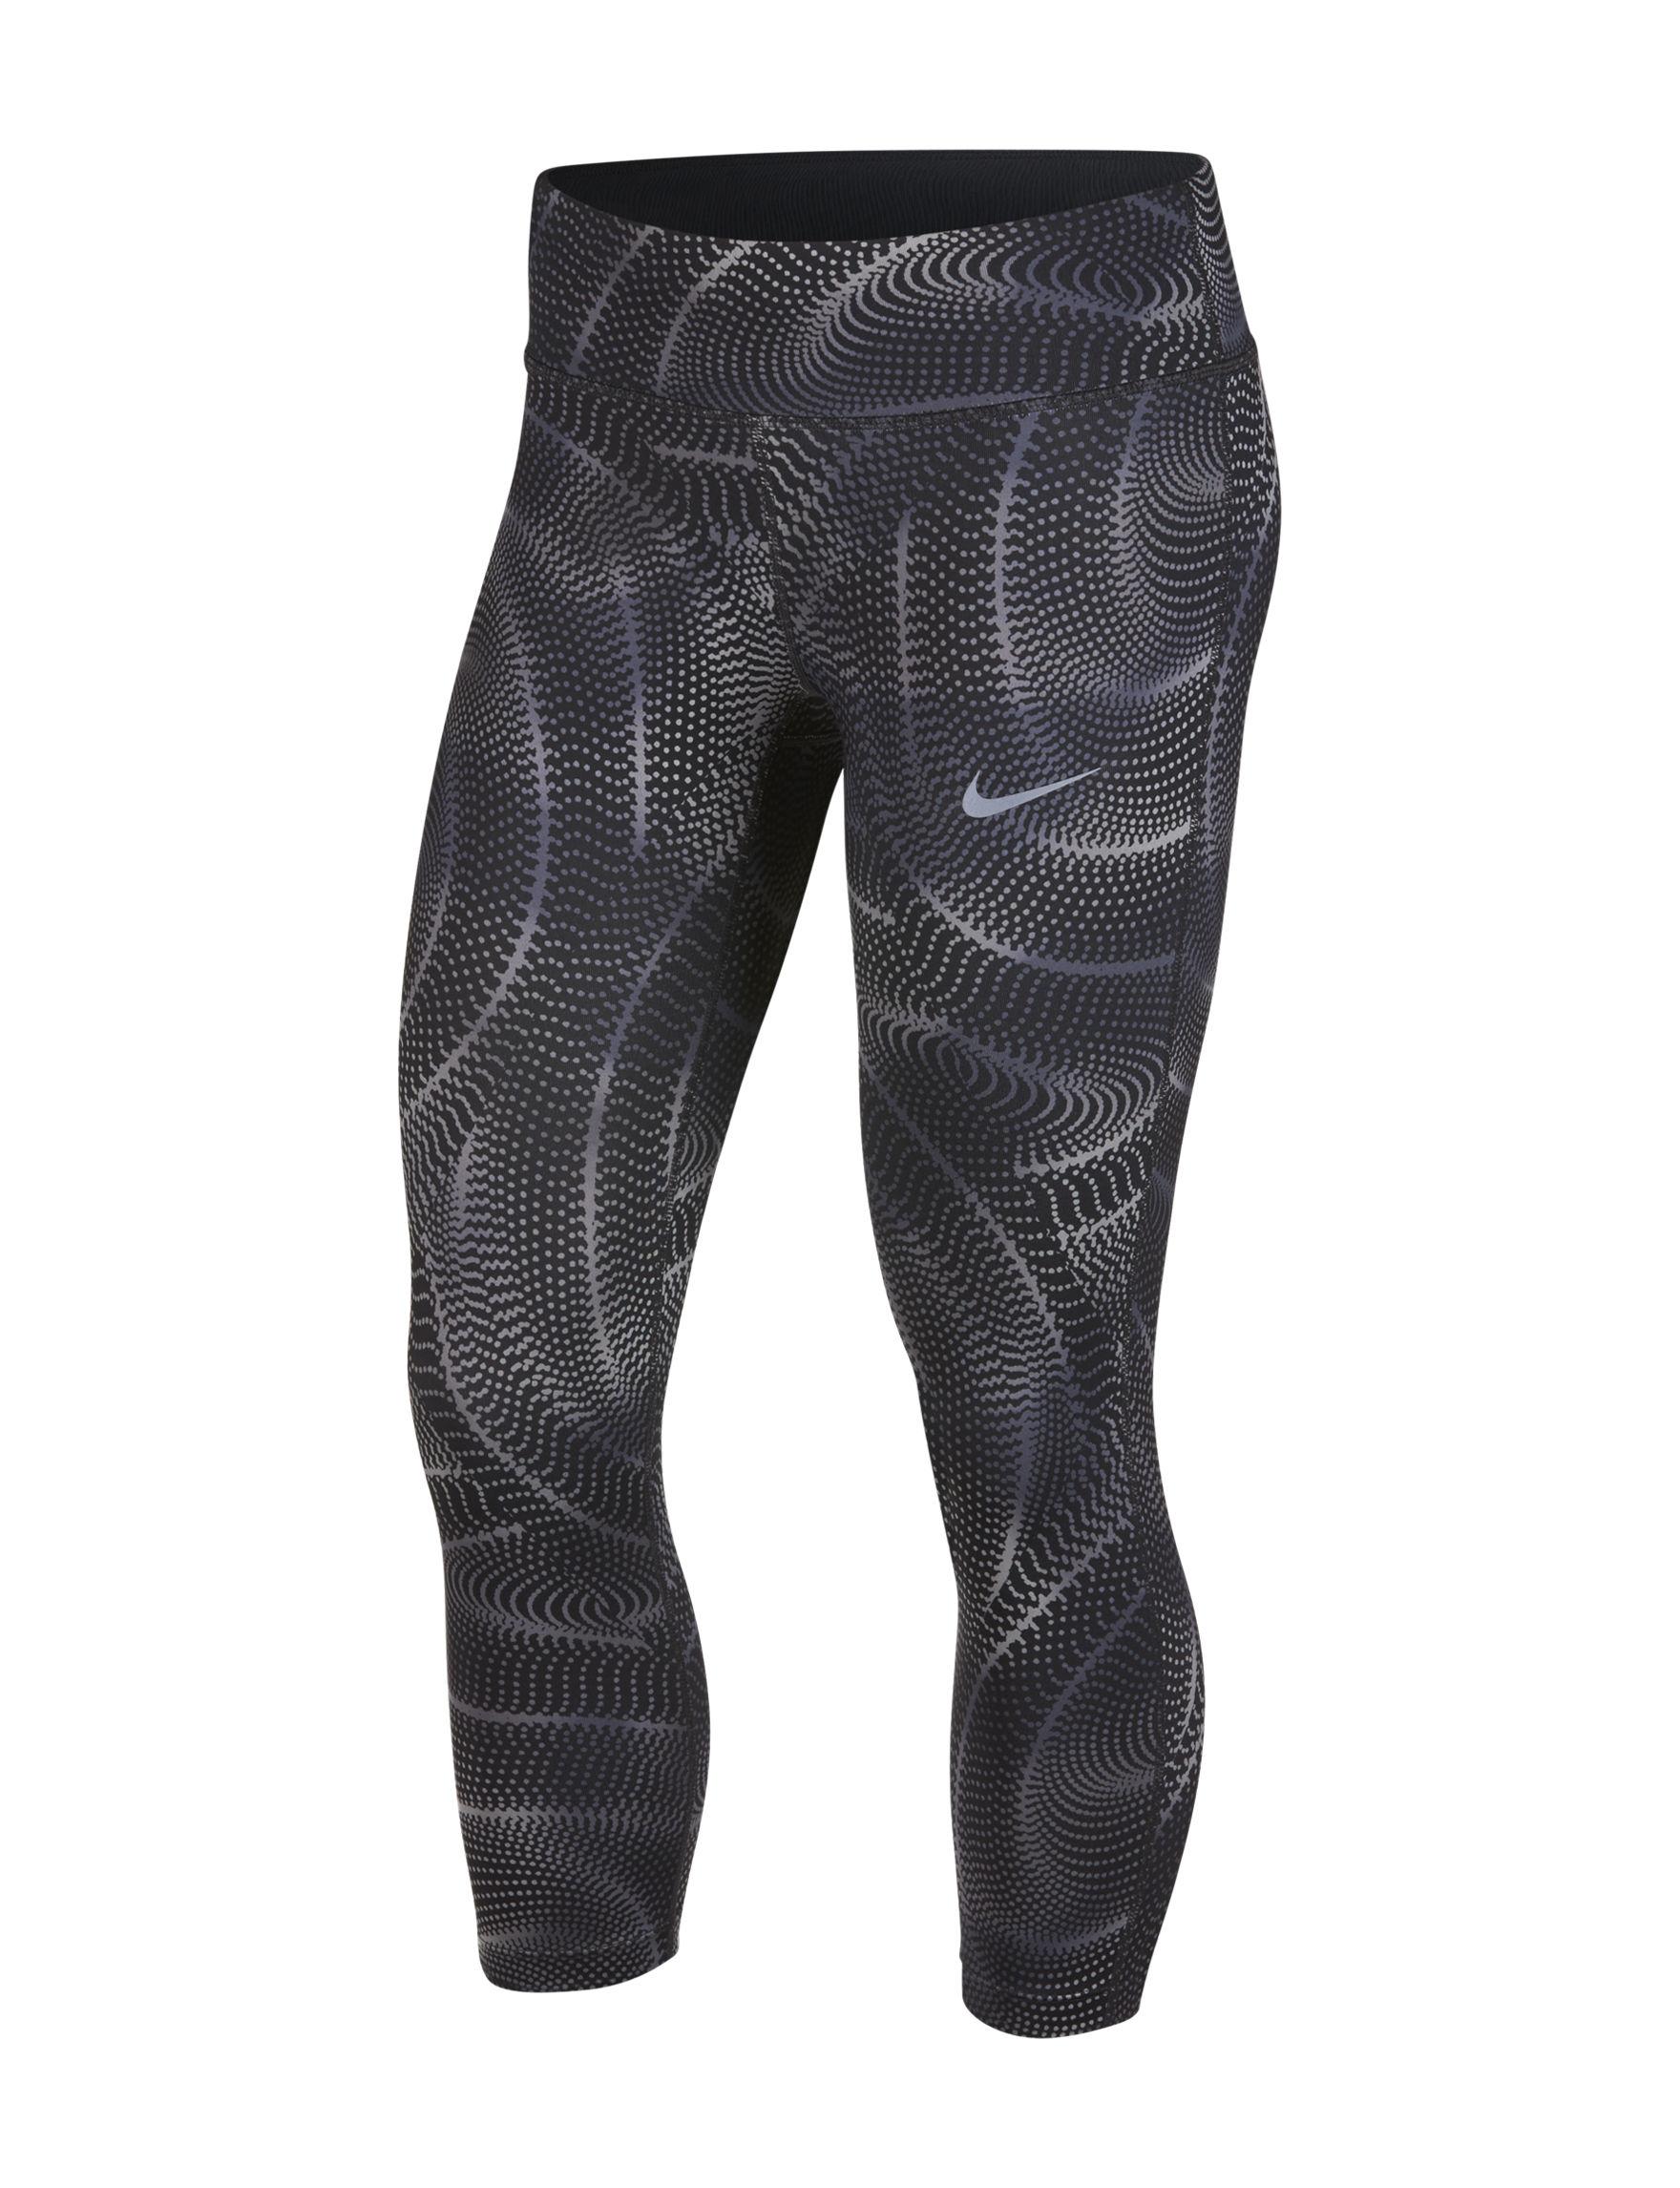 Nike Black / Grey Leggings